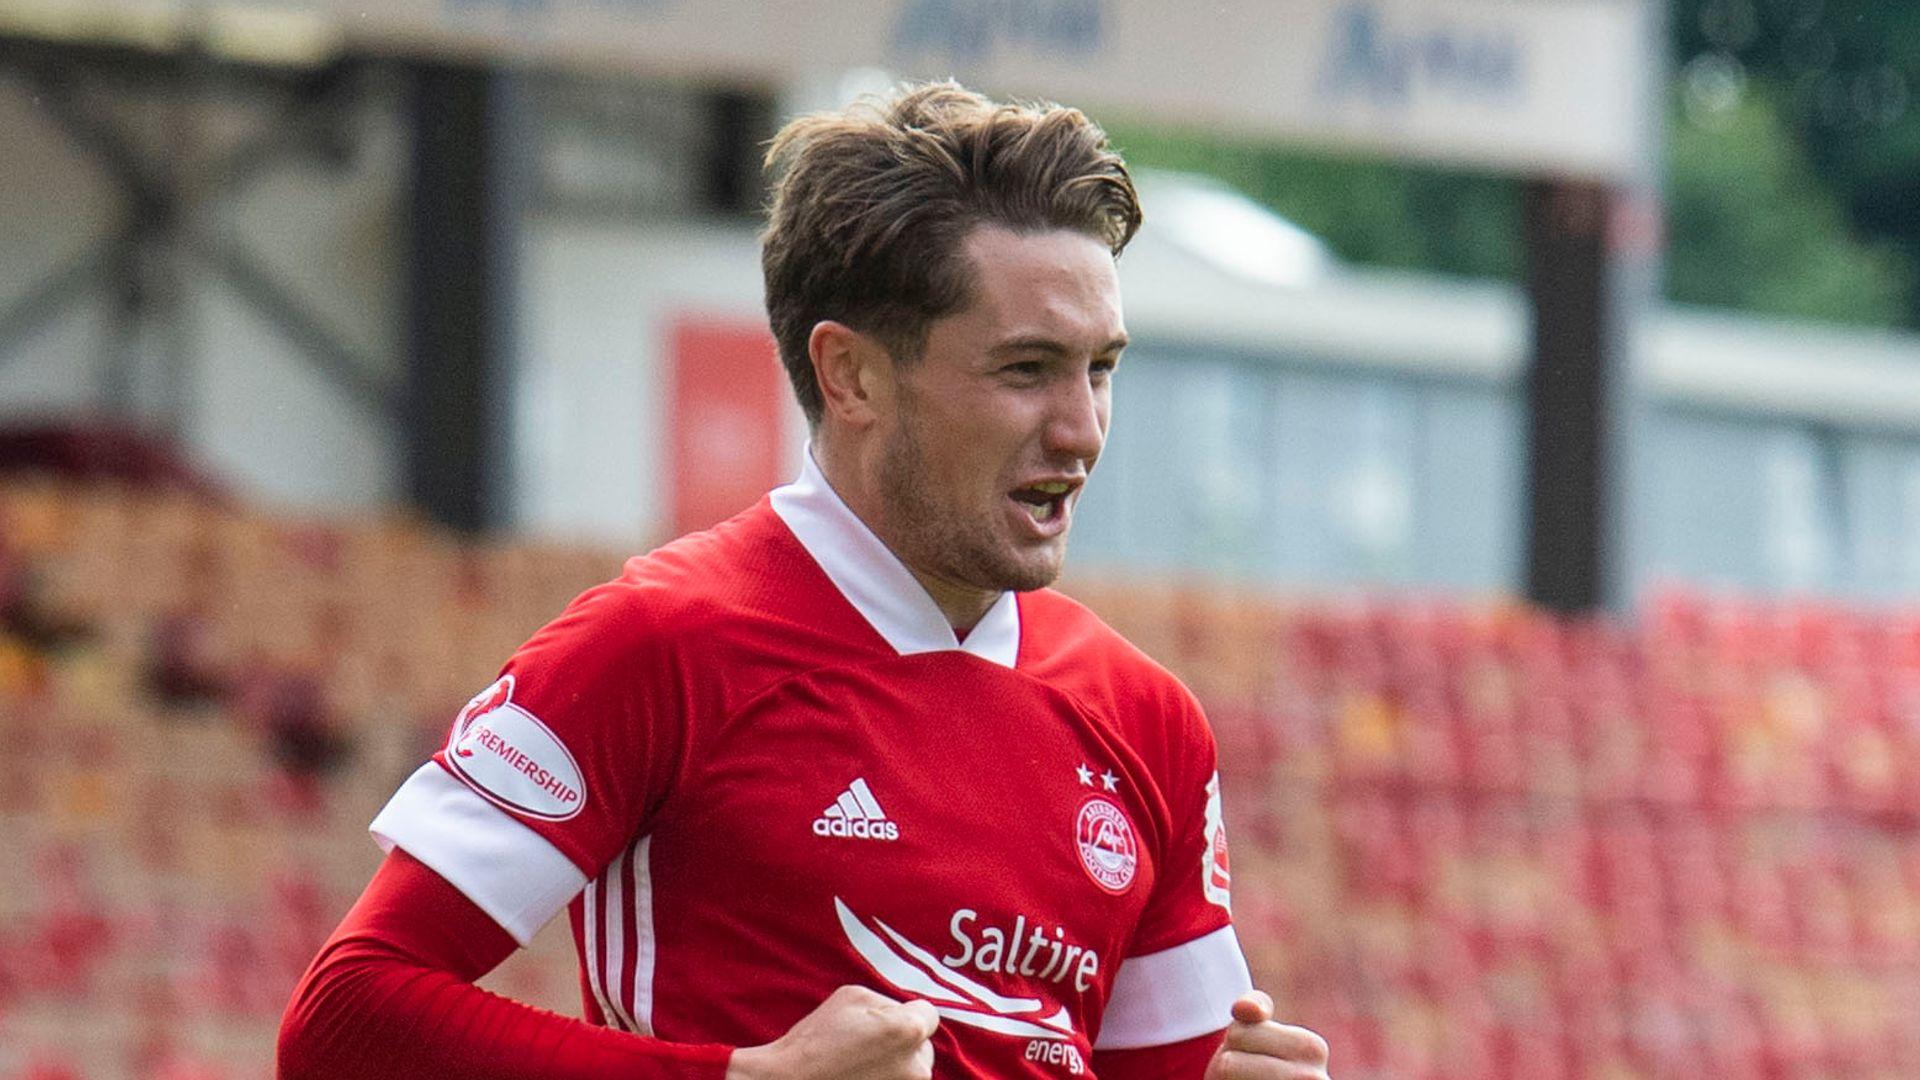 Aberdeen edge Livingston to secure win